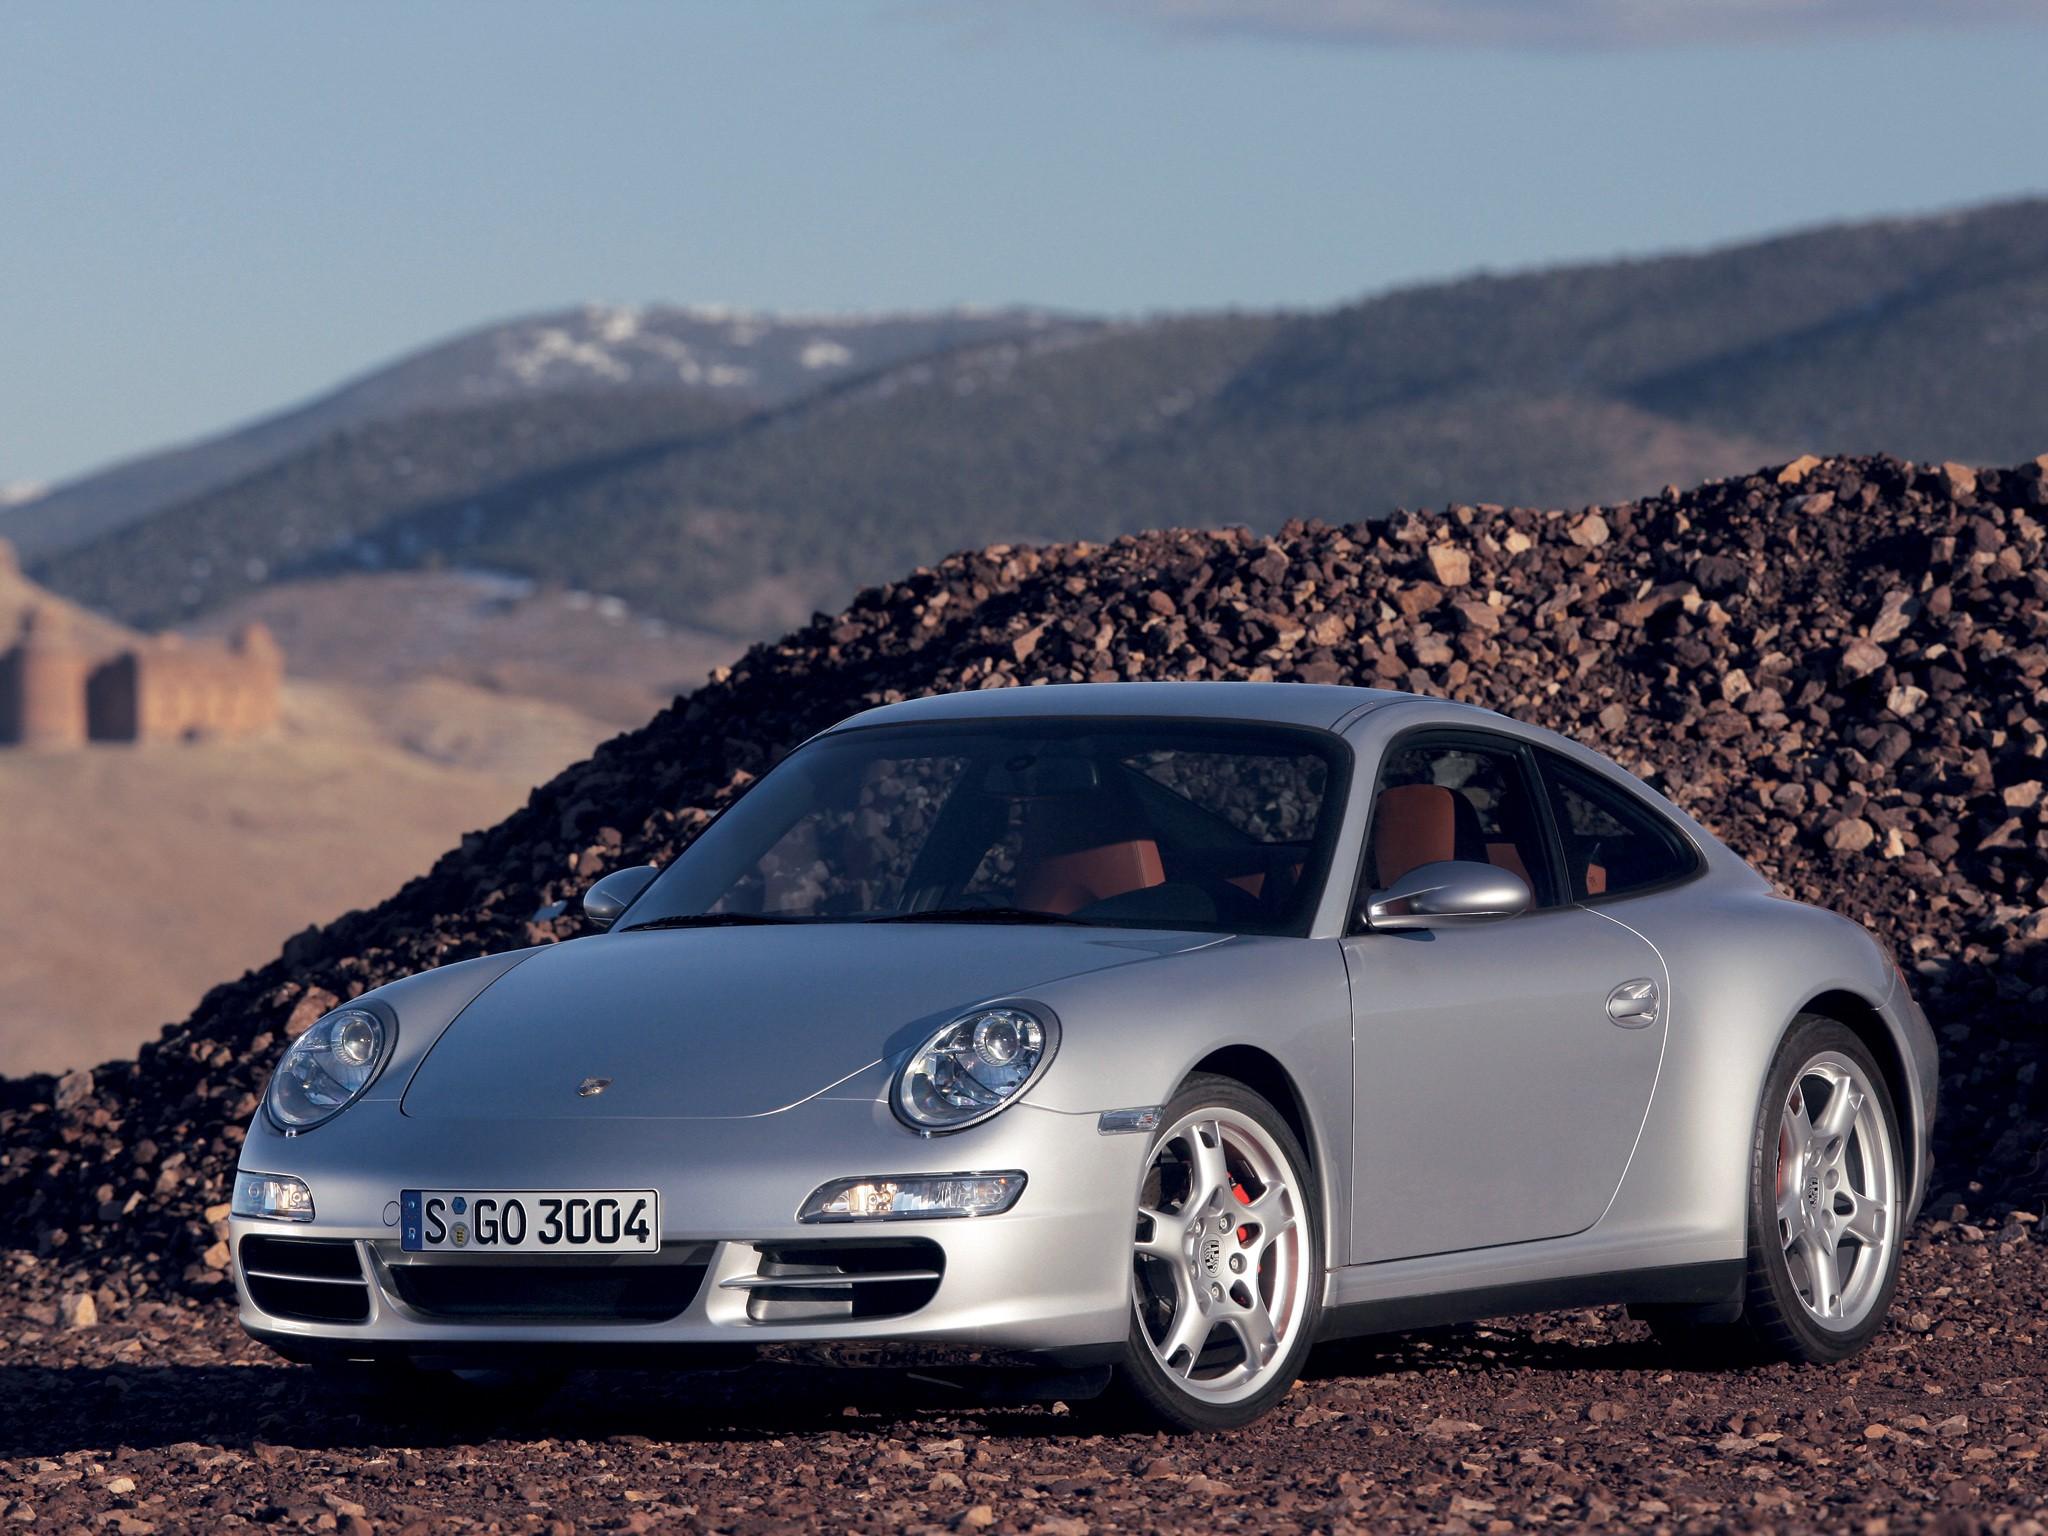 Porsche 911 Carrera 4s 997 Spezifikationen Fotos 2005 2006